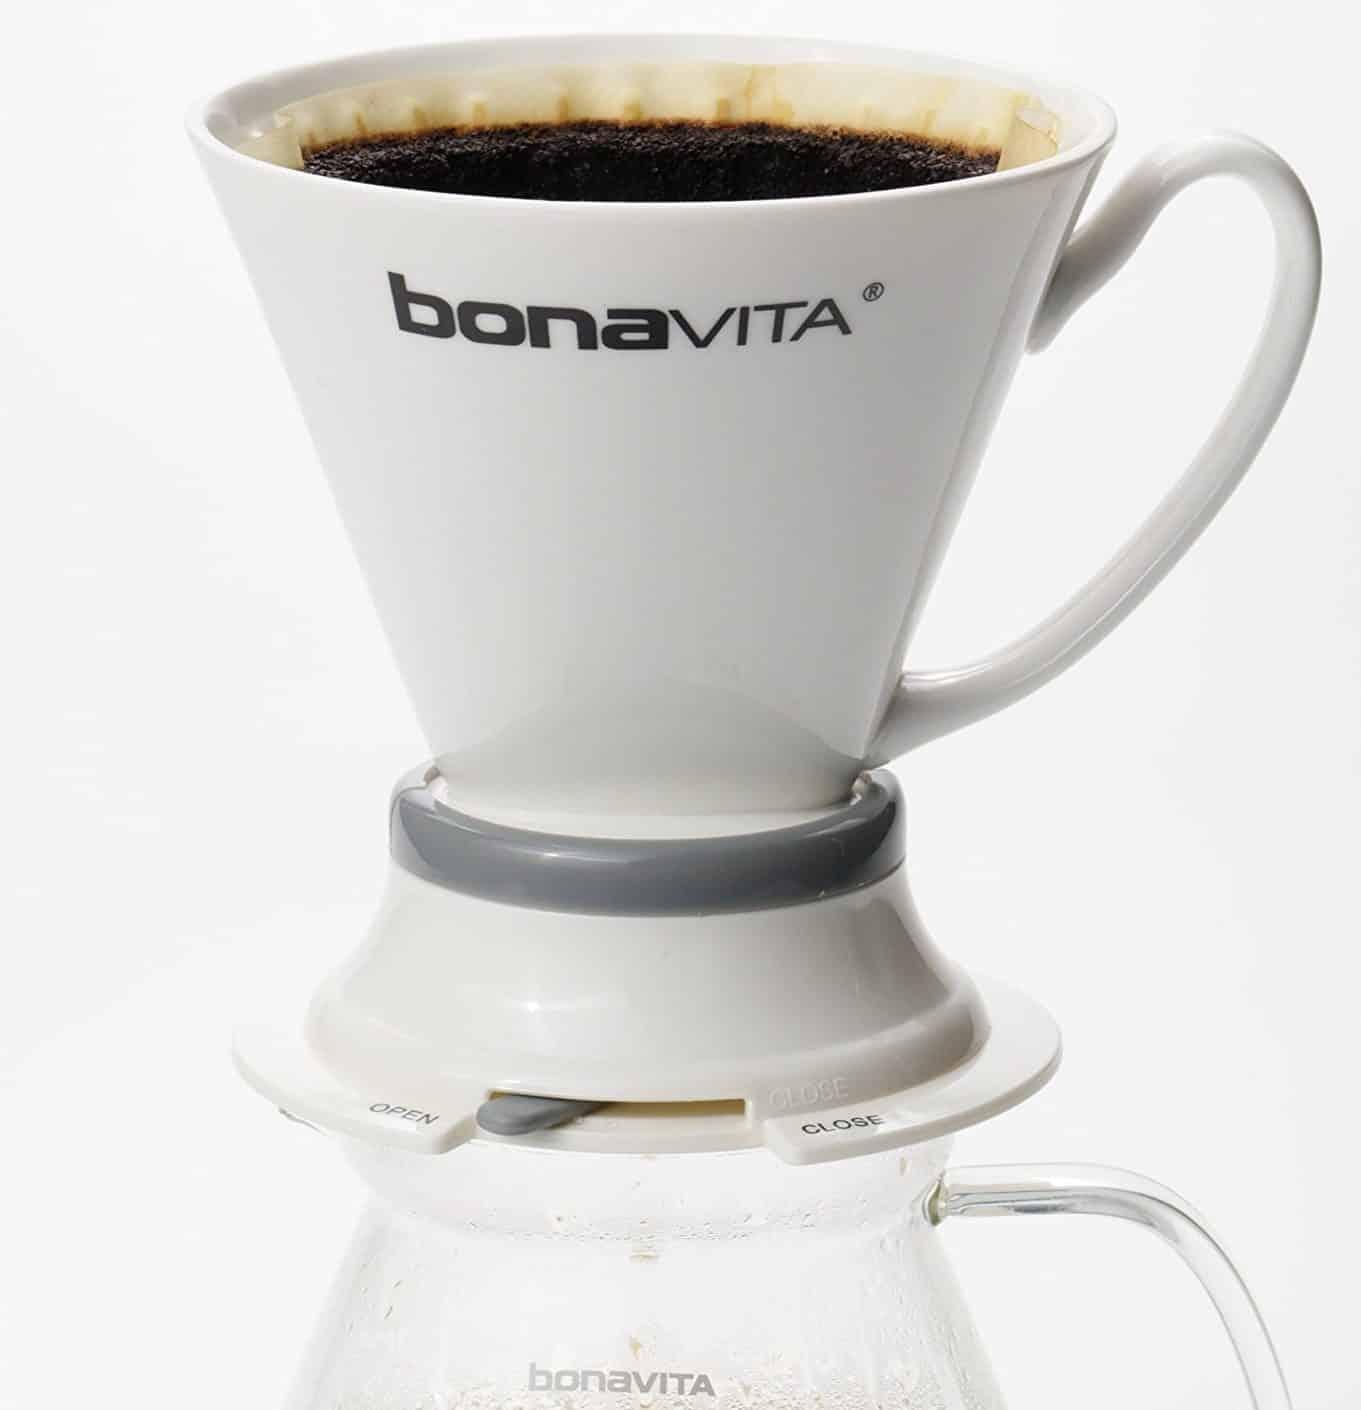 Bonavita - Wide Base Porcelain Immersion Dripper